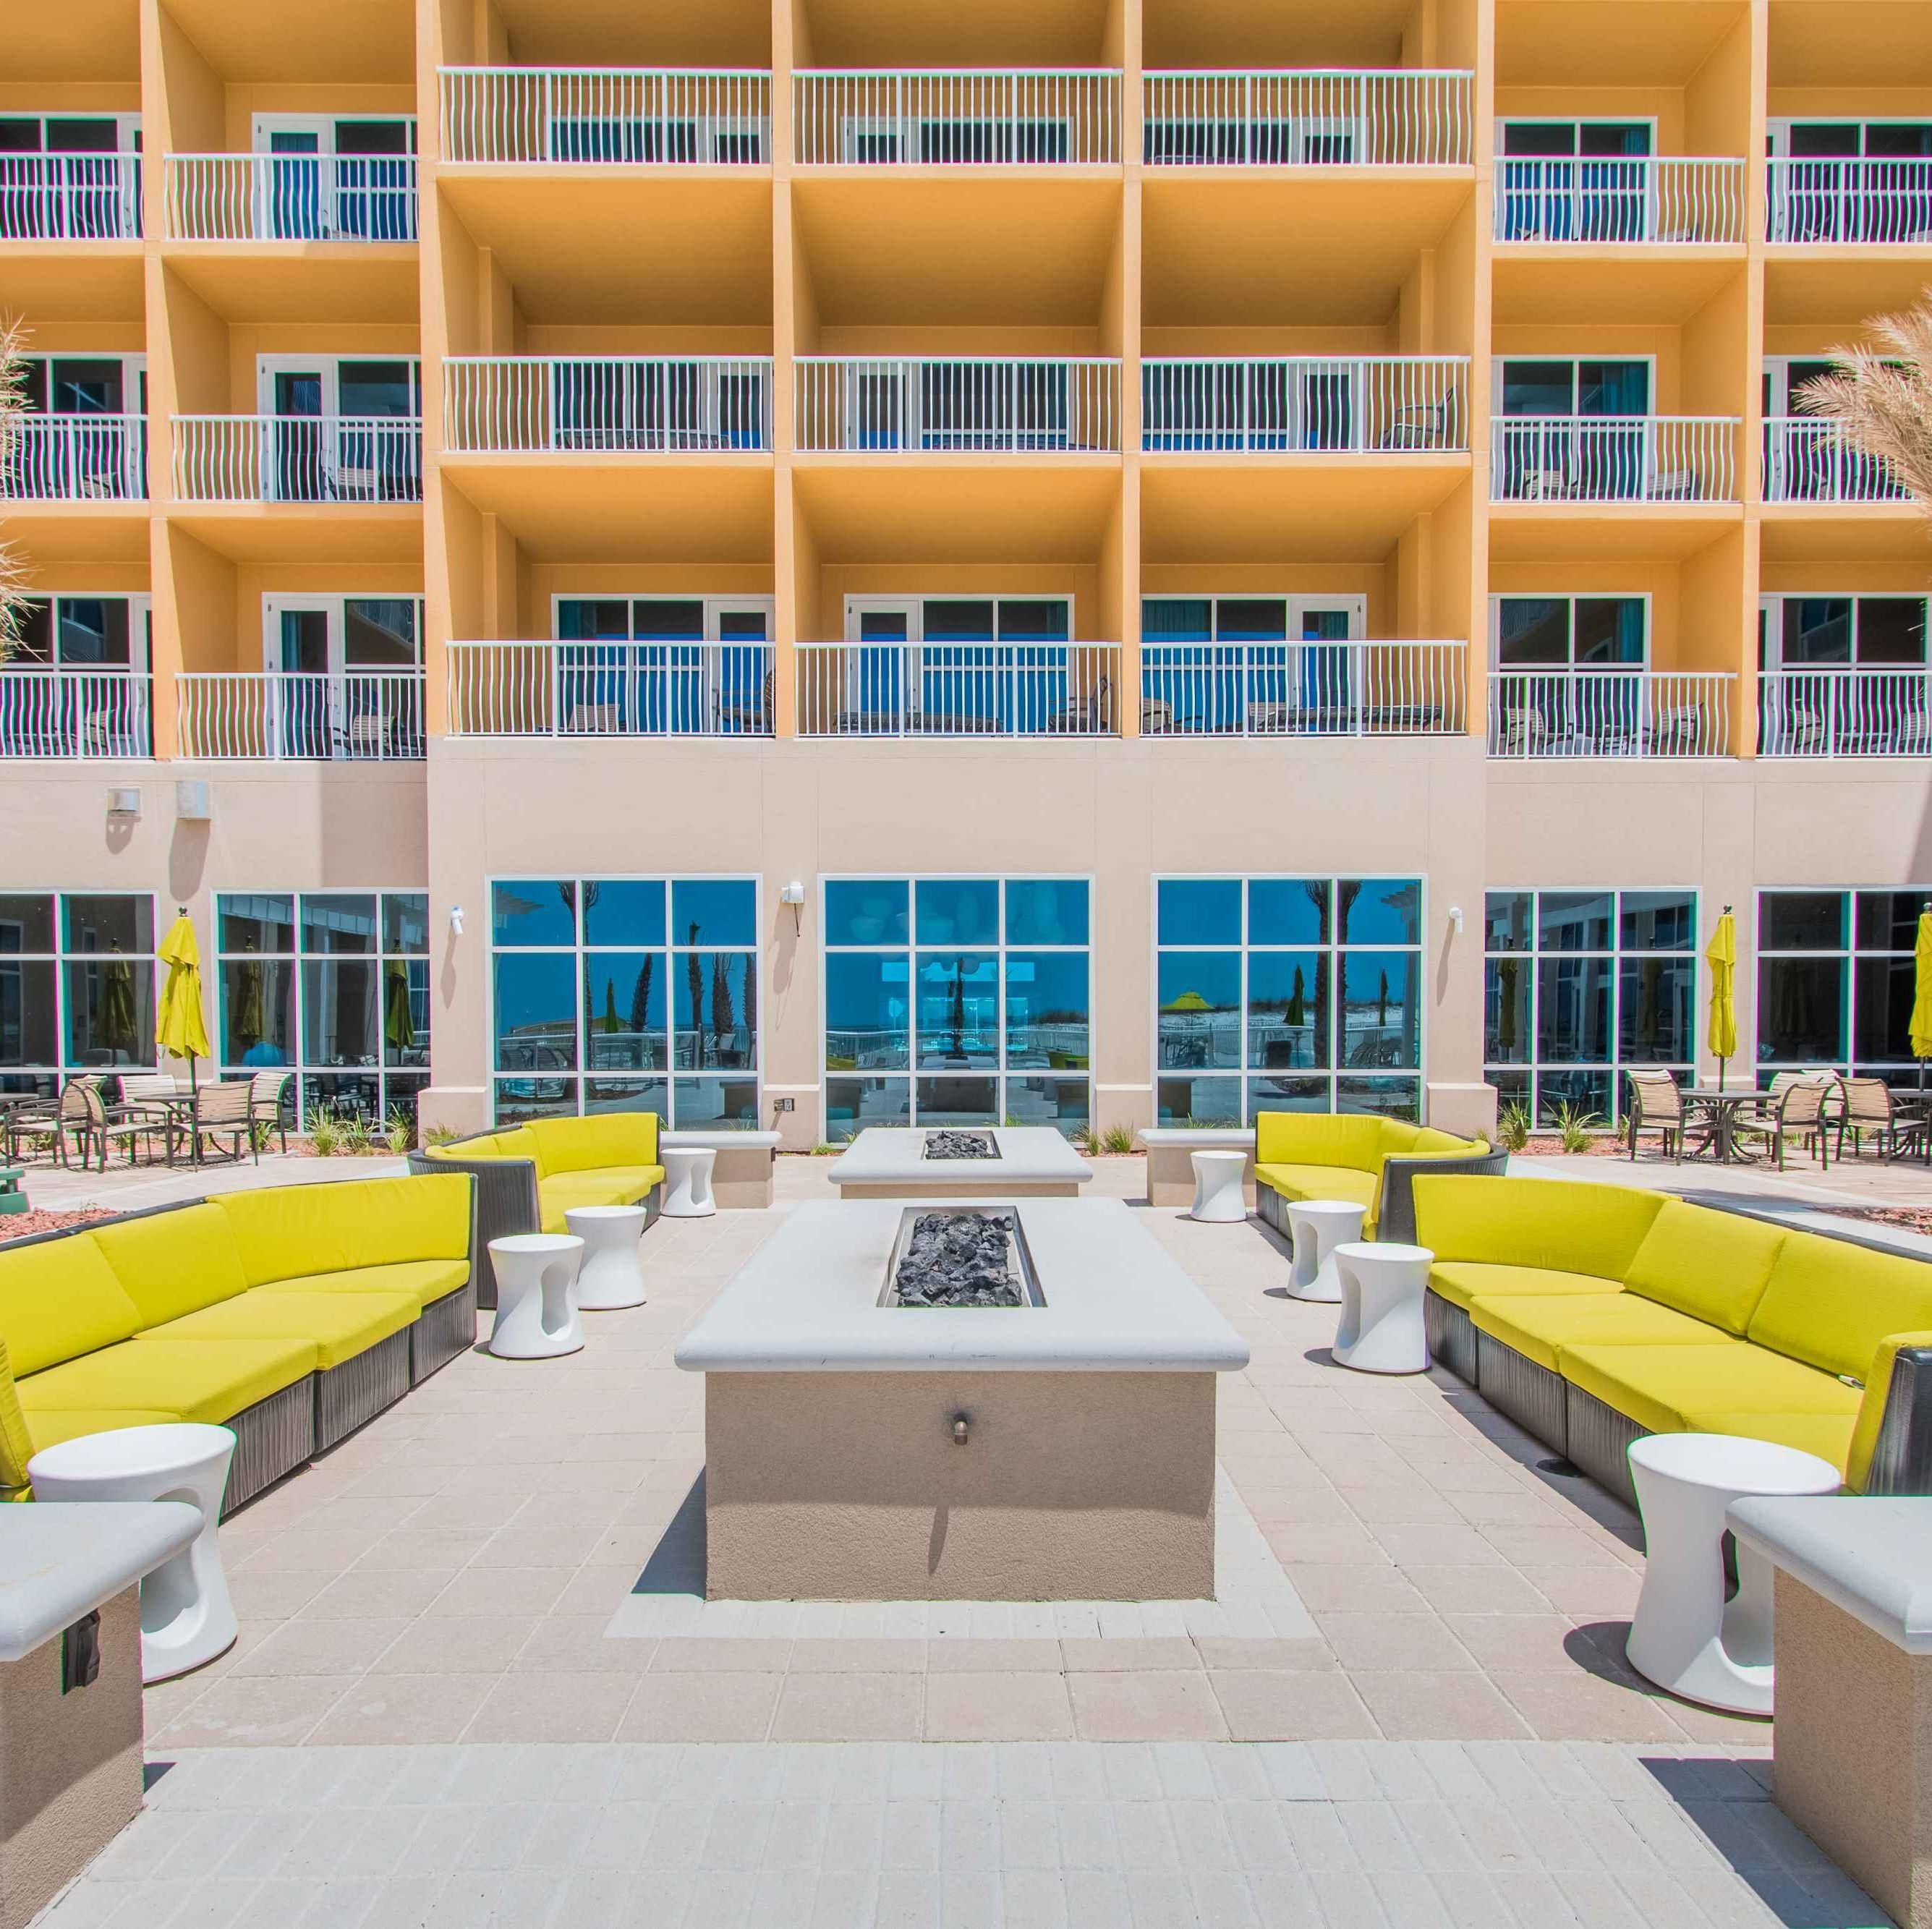 Have It All At Hgi Hilton Garden Inn Architectural Features Fort Walton Beach